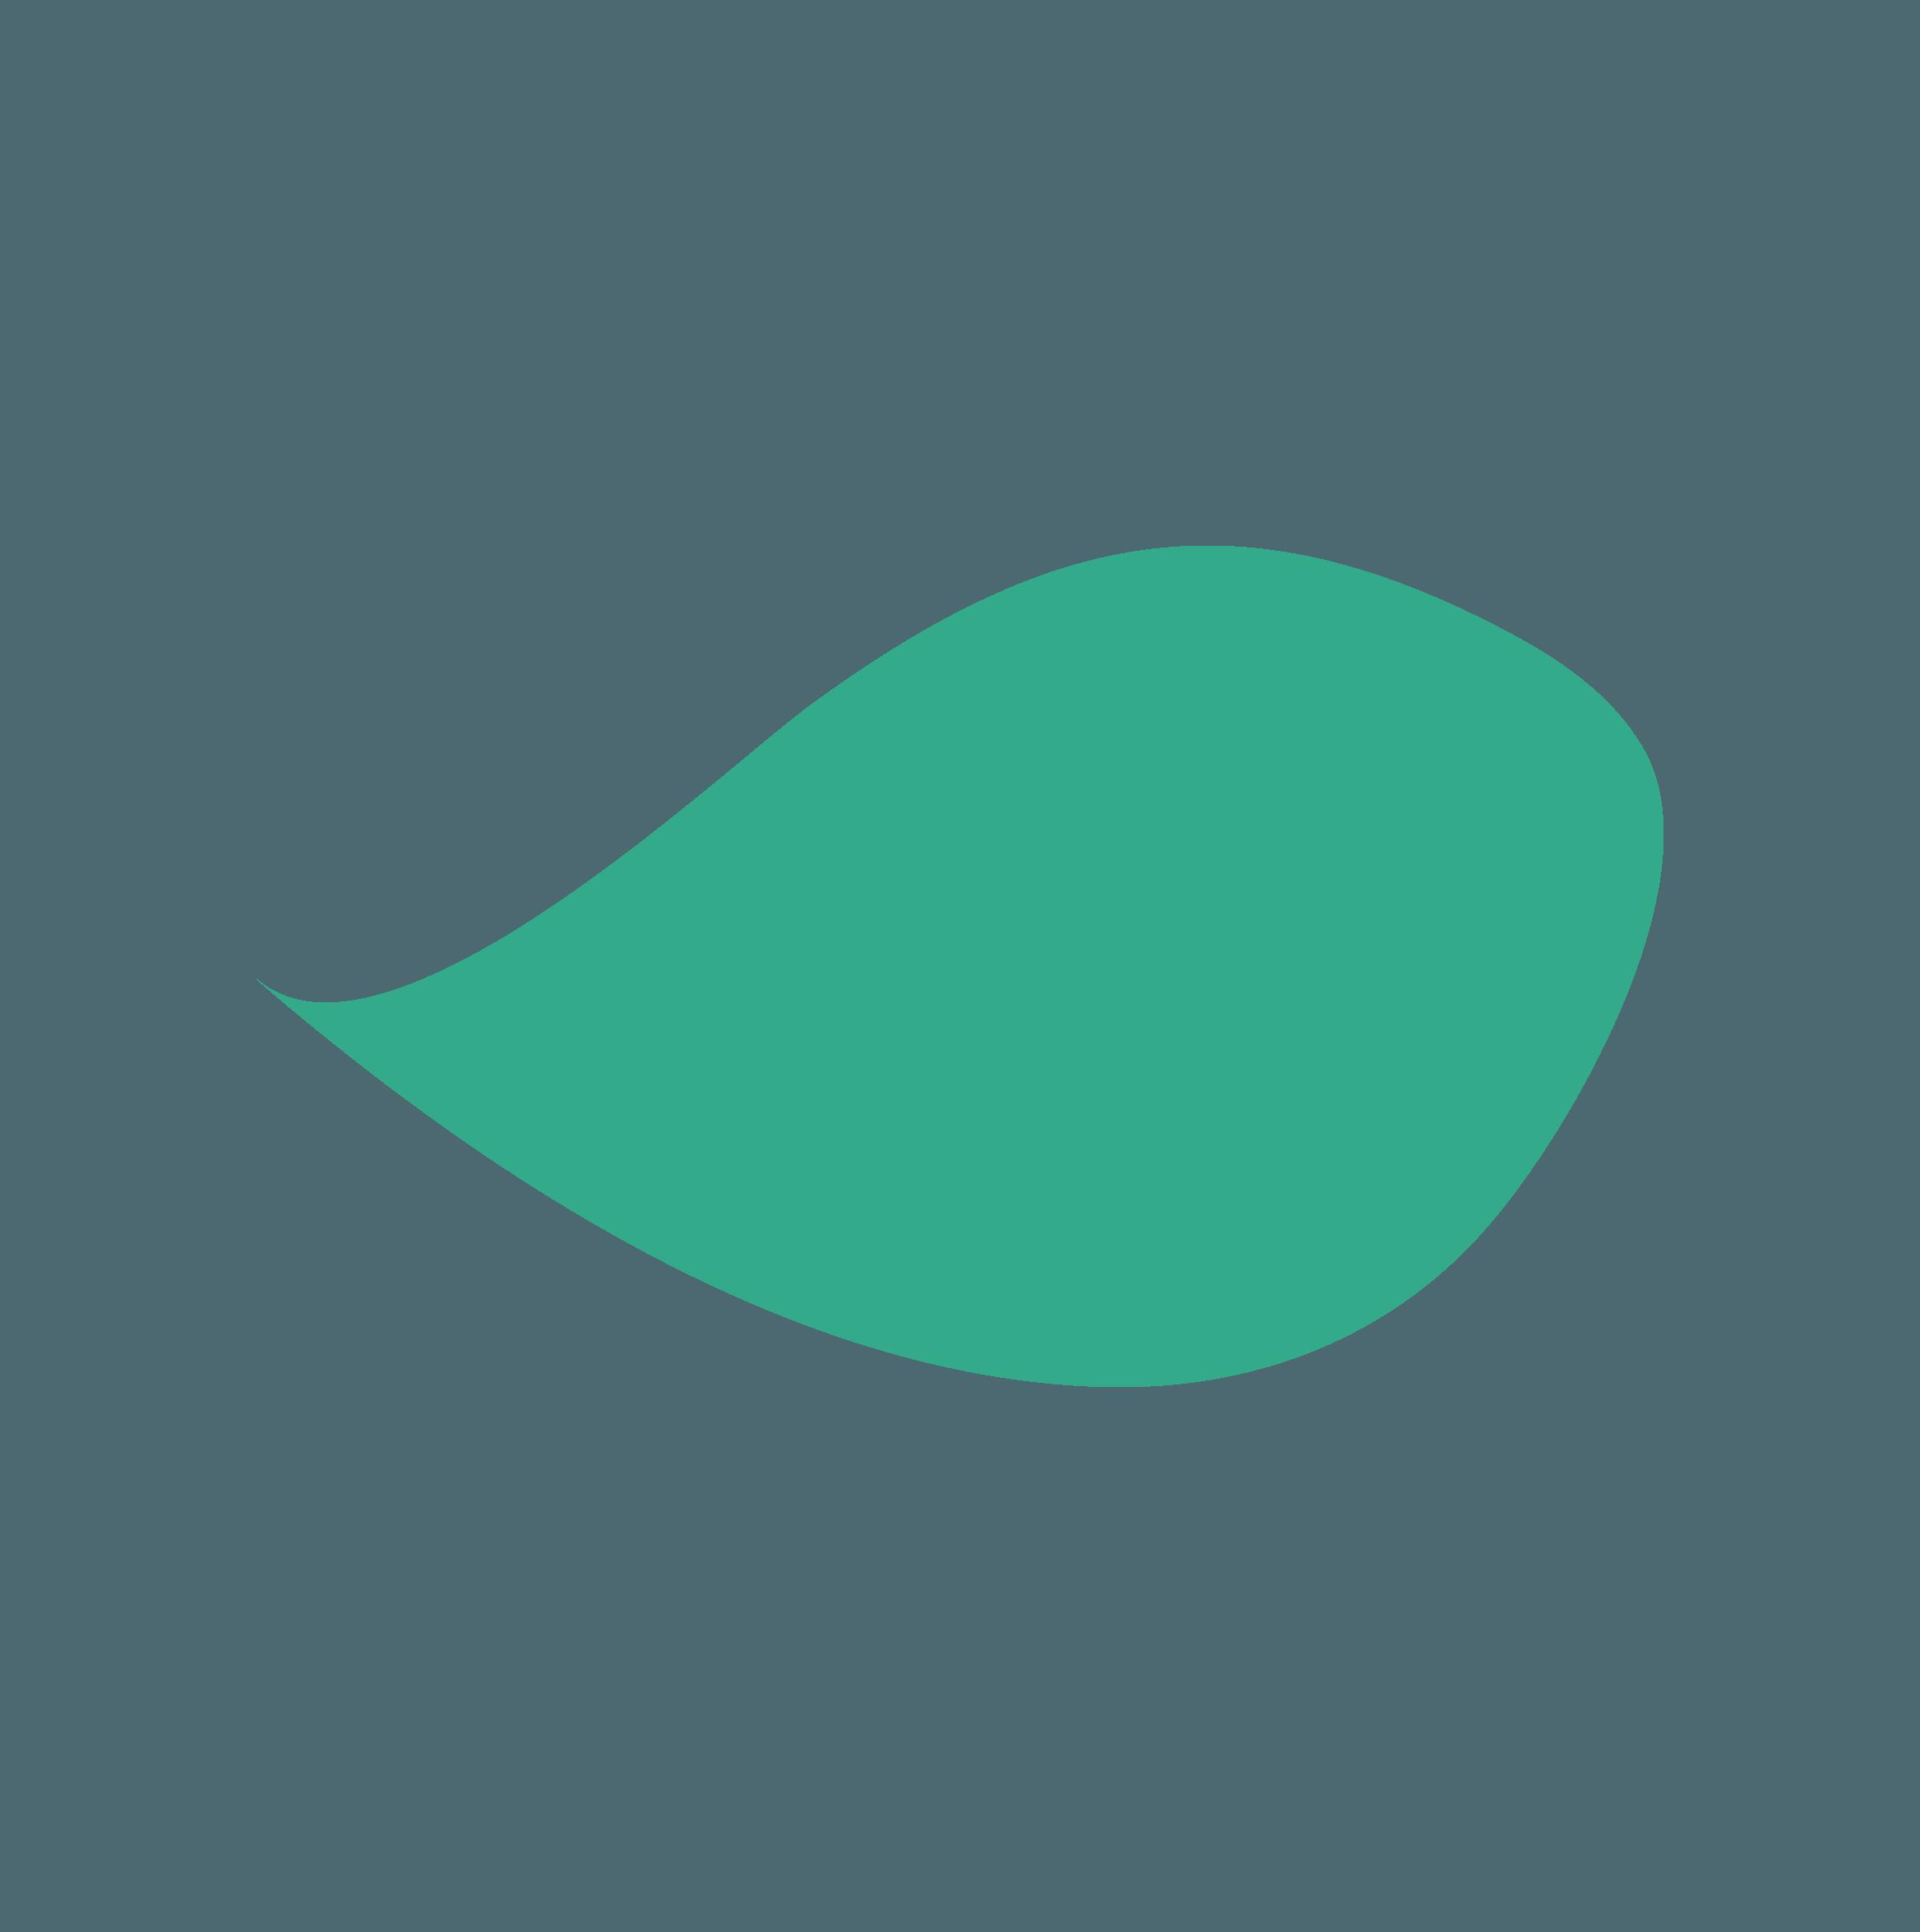 ee leaf